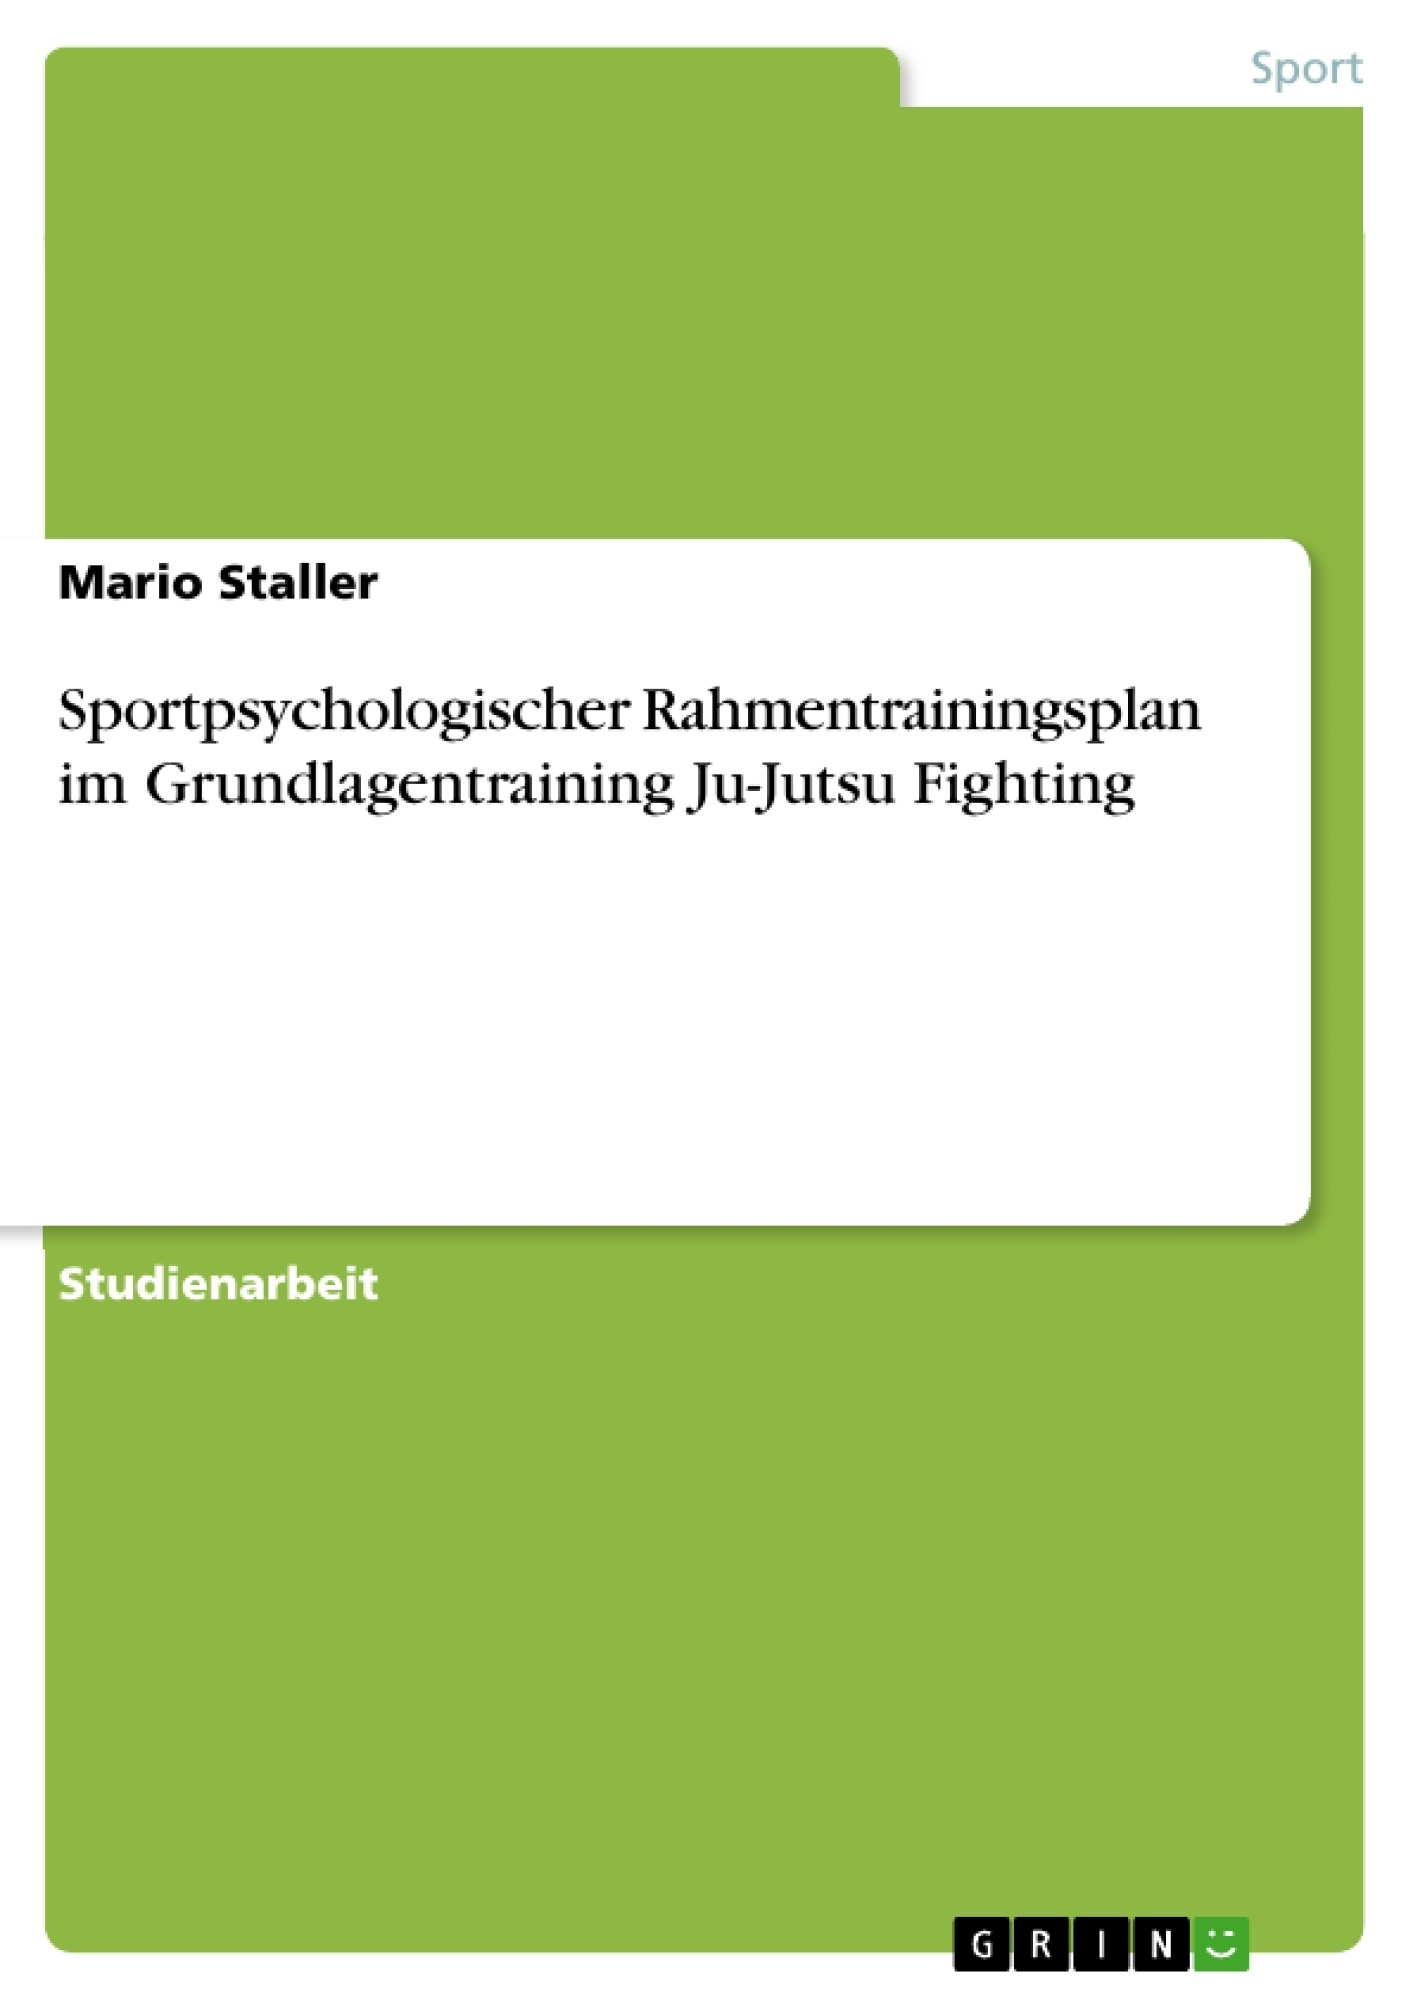 Titel: Sportpsychologischer Rahmentrainingsplan im Grundlagentraining Ju-Jutsu Fighting